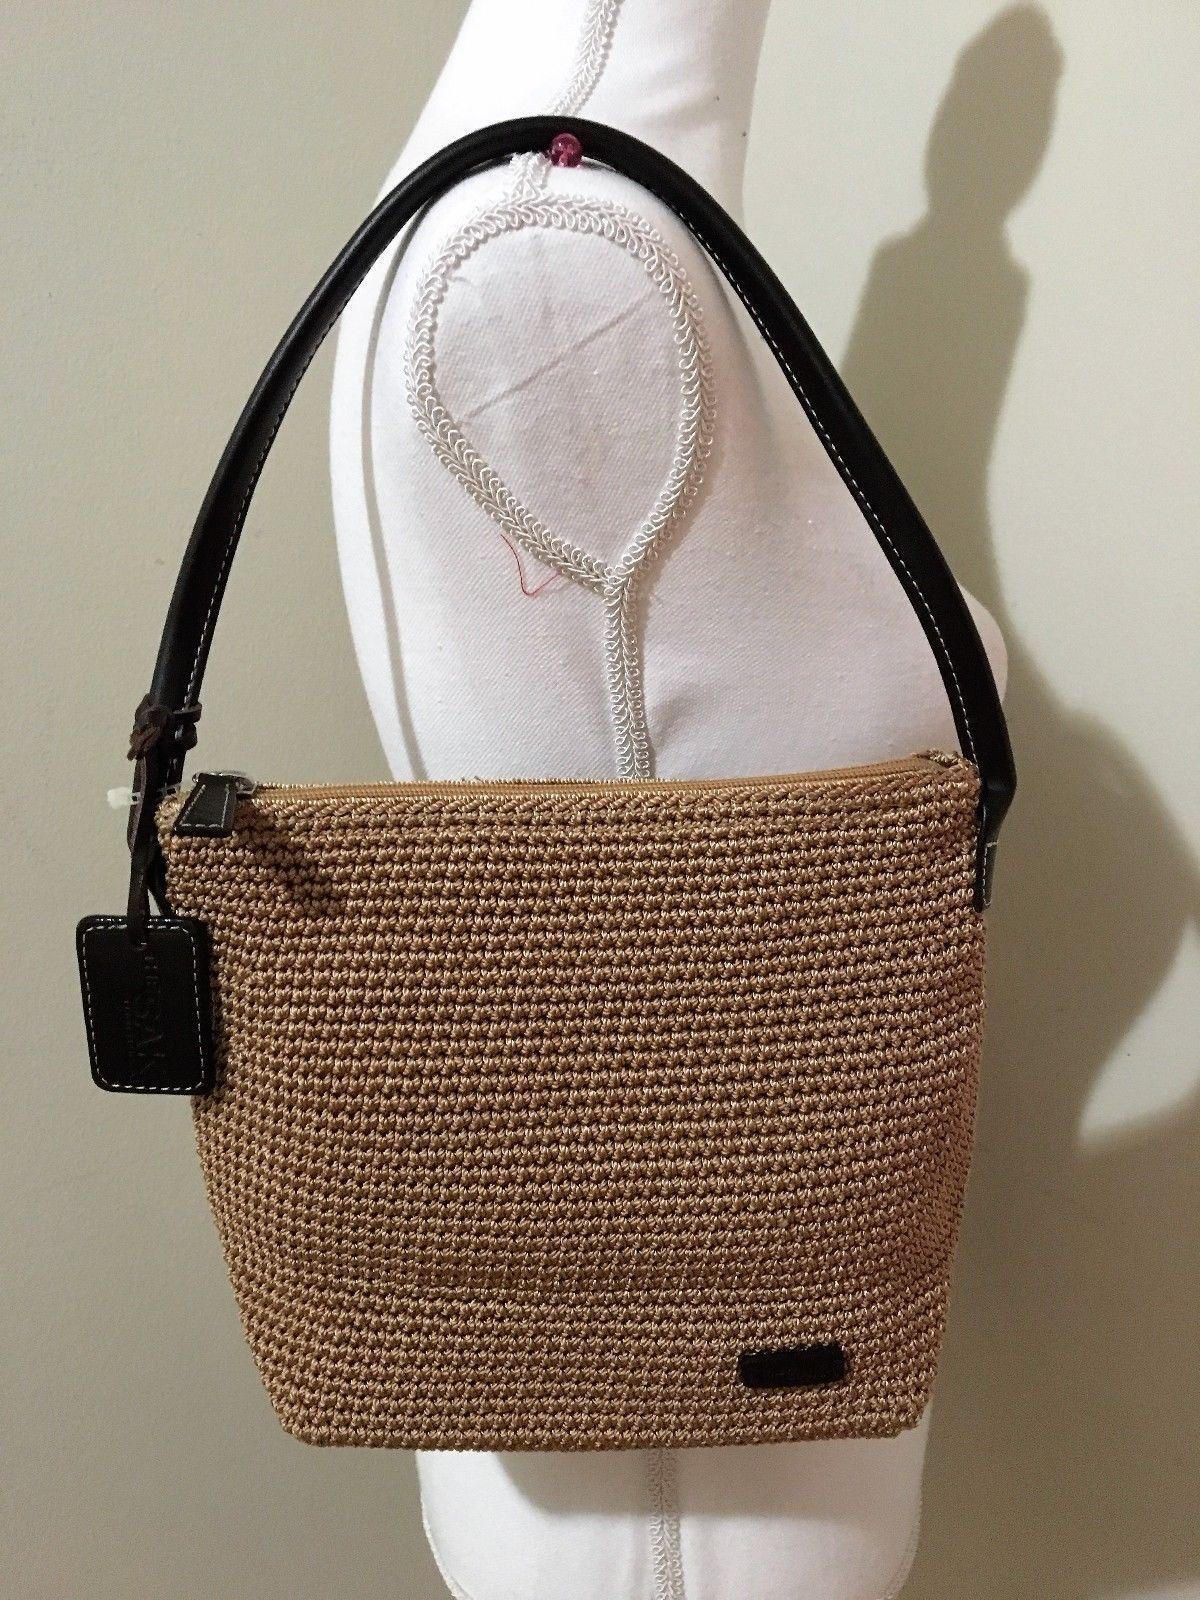 The Sak Bags The Sak Crochet Handbag Purse Navy Blue Red Euc Half